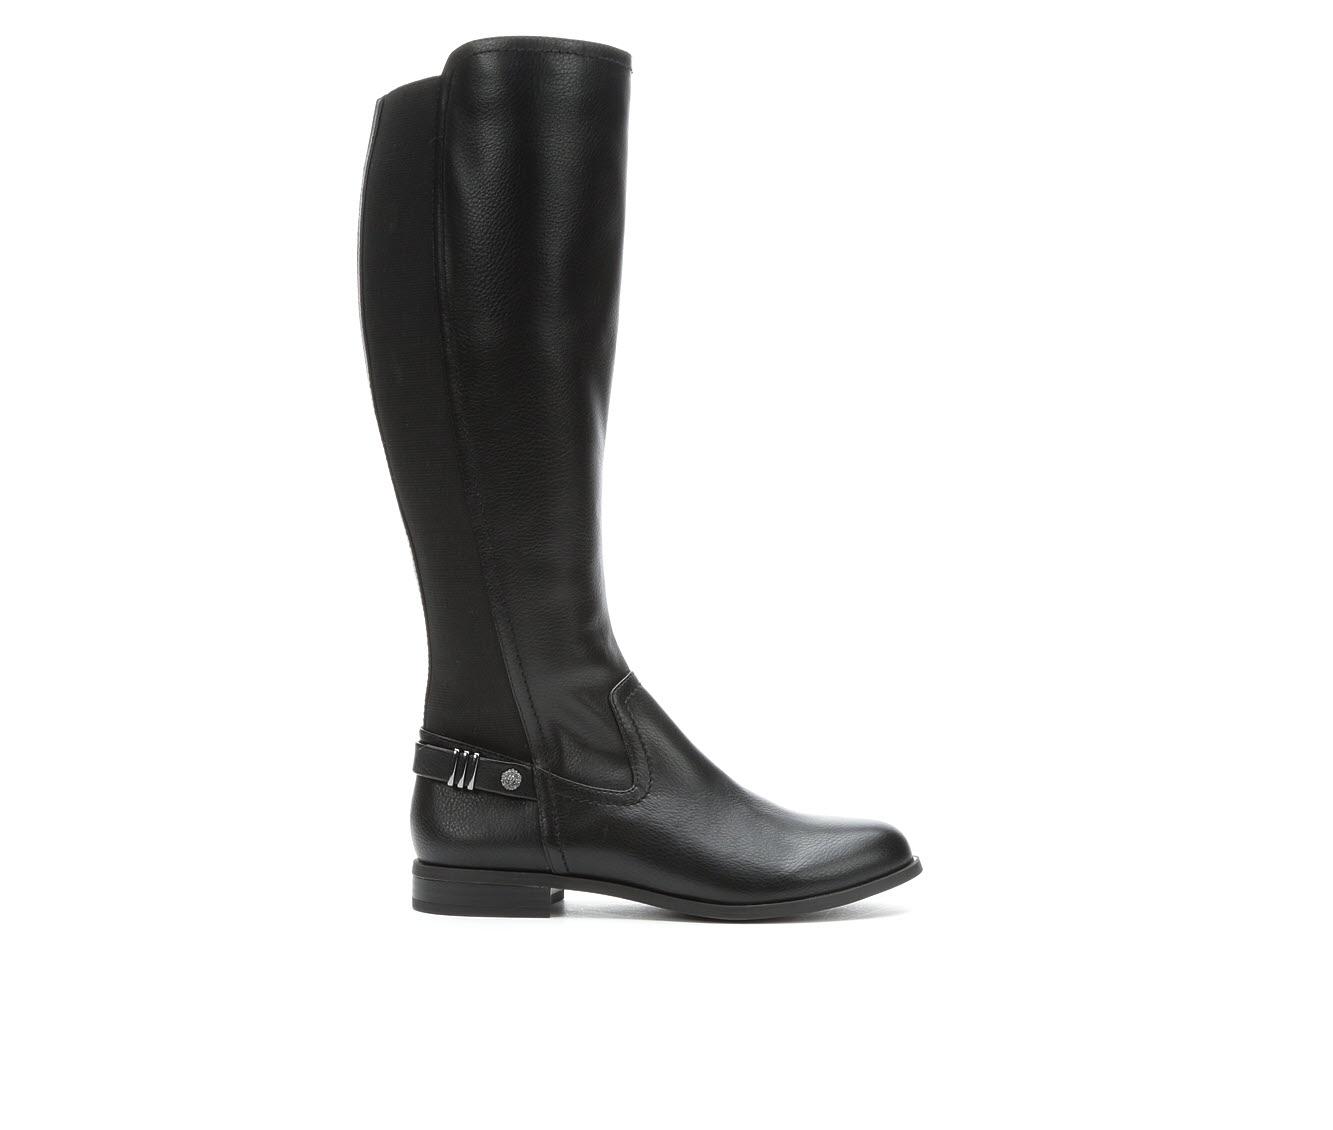 Anne Klein Sport Basia Women's Boot (Black Faux Leather)